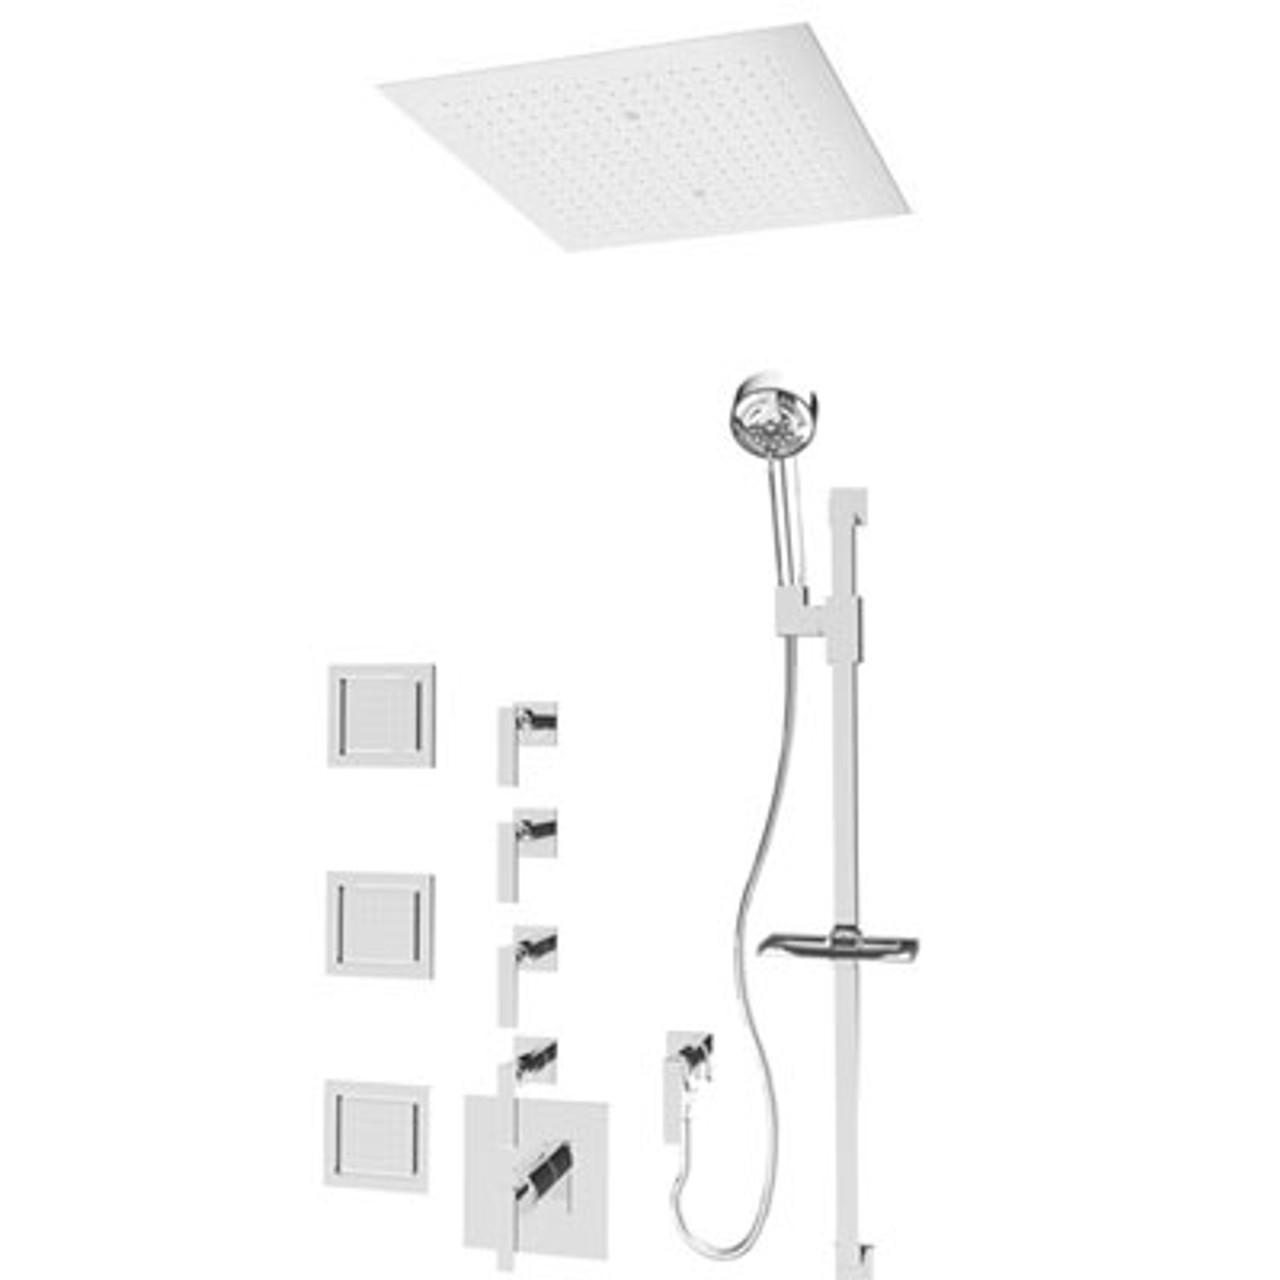 Rubi Kali 3 4 Thermostatic Shower With Body Jets 18 X 18 Flush Rain Head Brushed Nickel